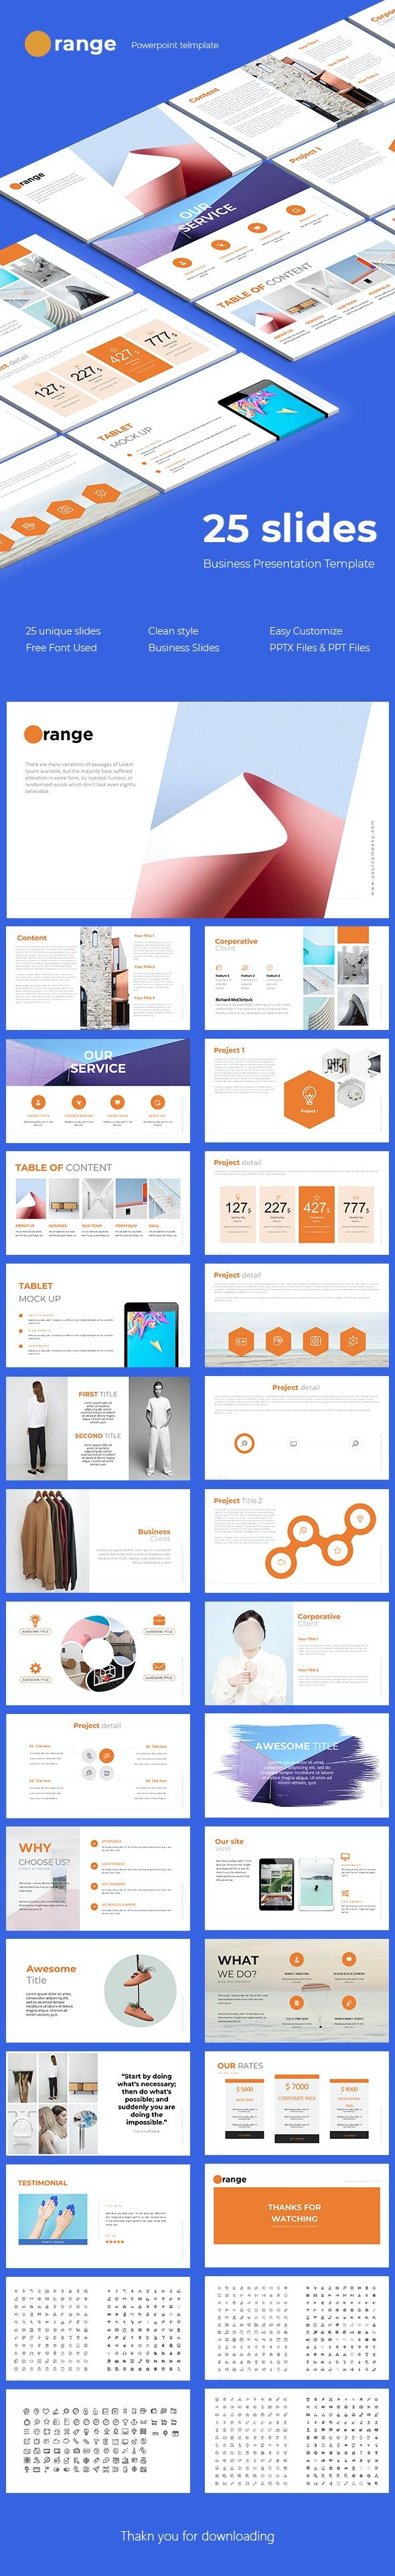 Orange Powerpoint Template - Business PowerPoint Templates